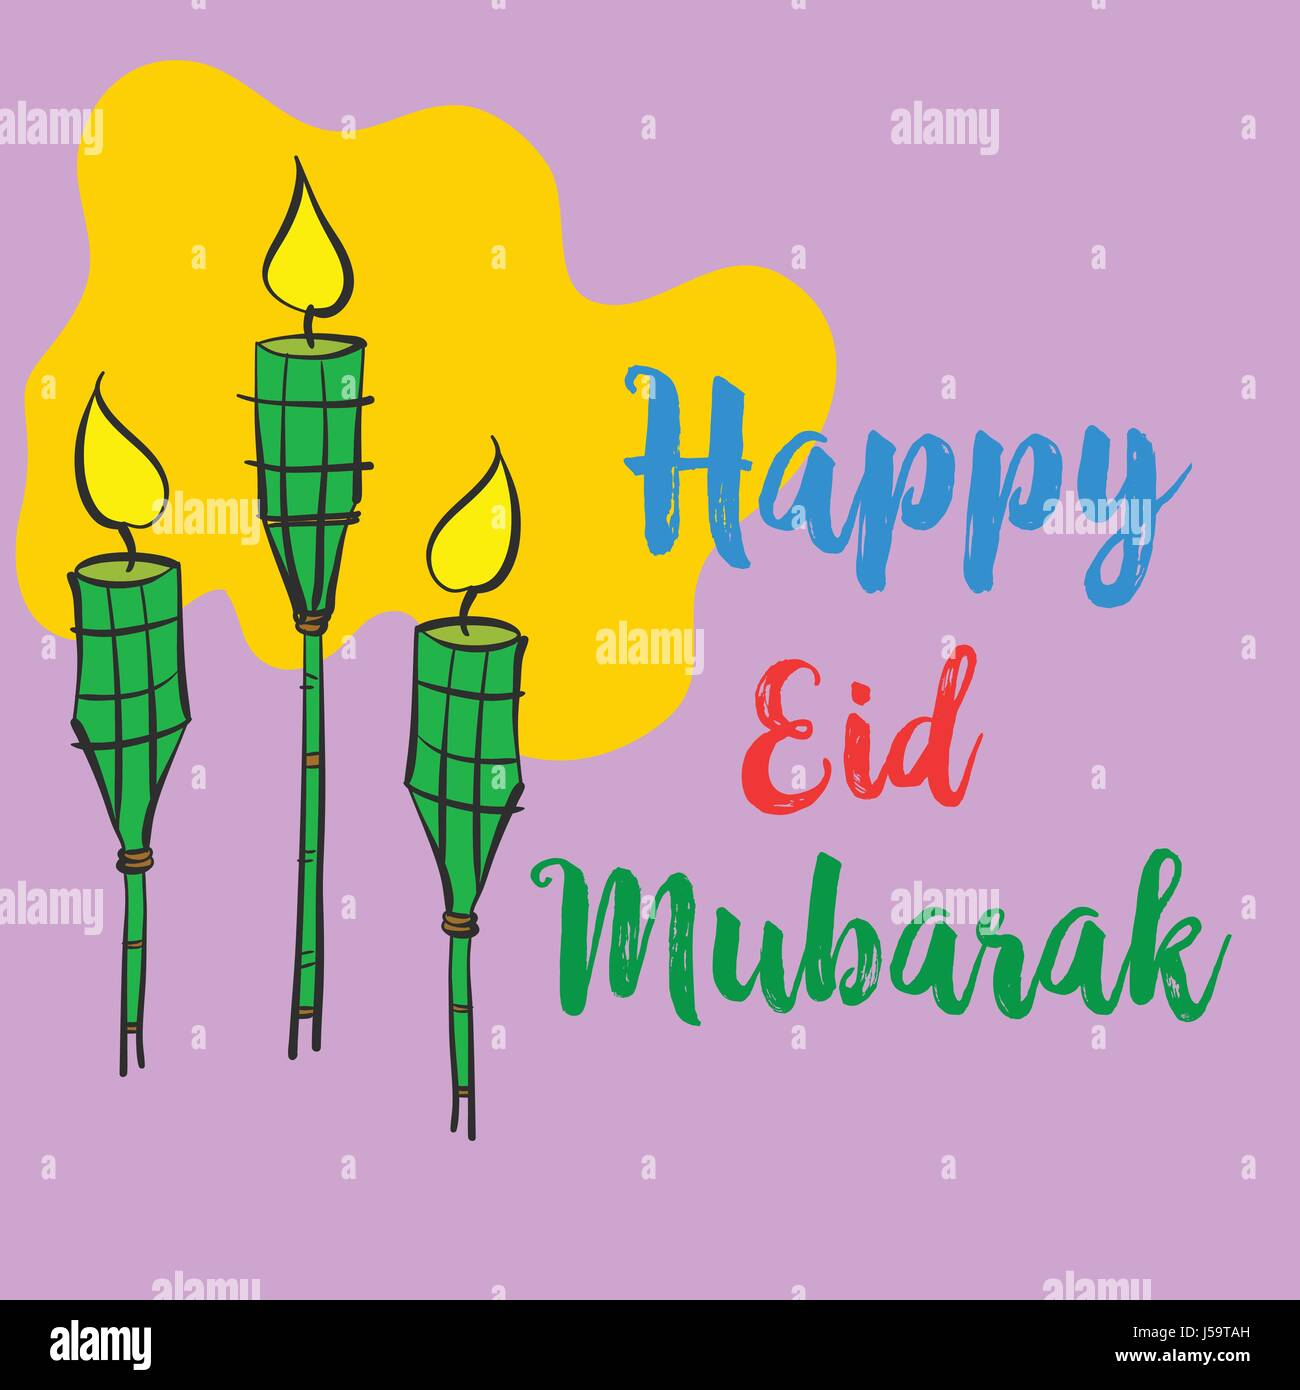 Colorful style eid mubarak greeting card stock vector art colorful style eid mubarak greeting card m4hsunfo